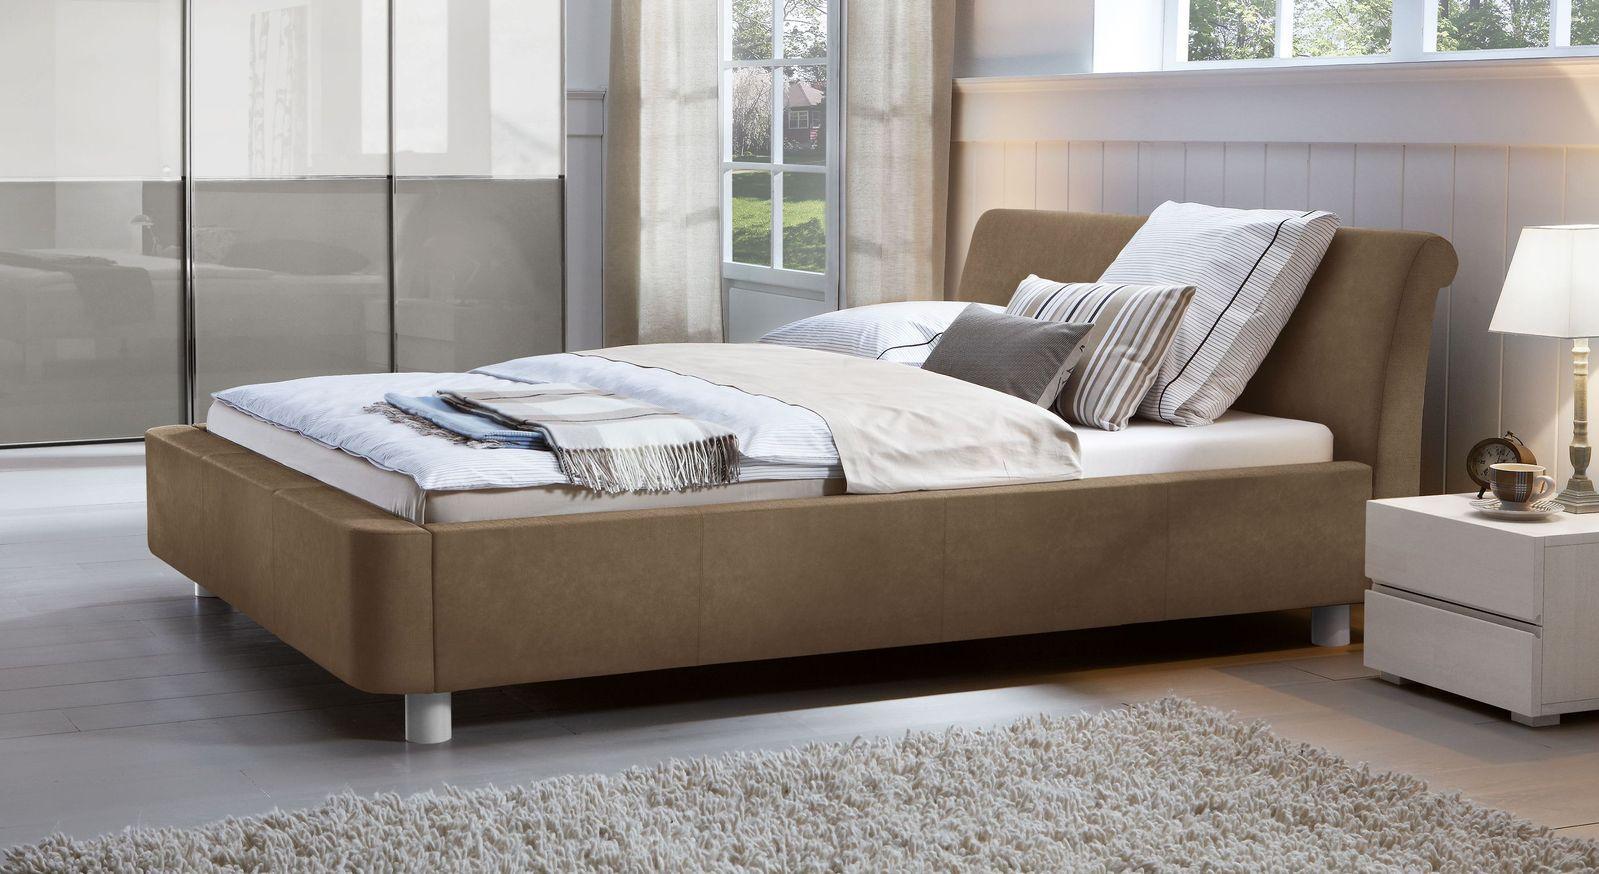 Geschwungenes Kunstlederbett in Standard- & Übergröße - Macuma